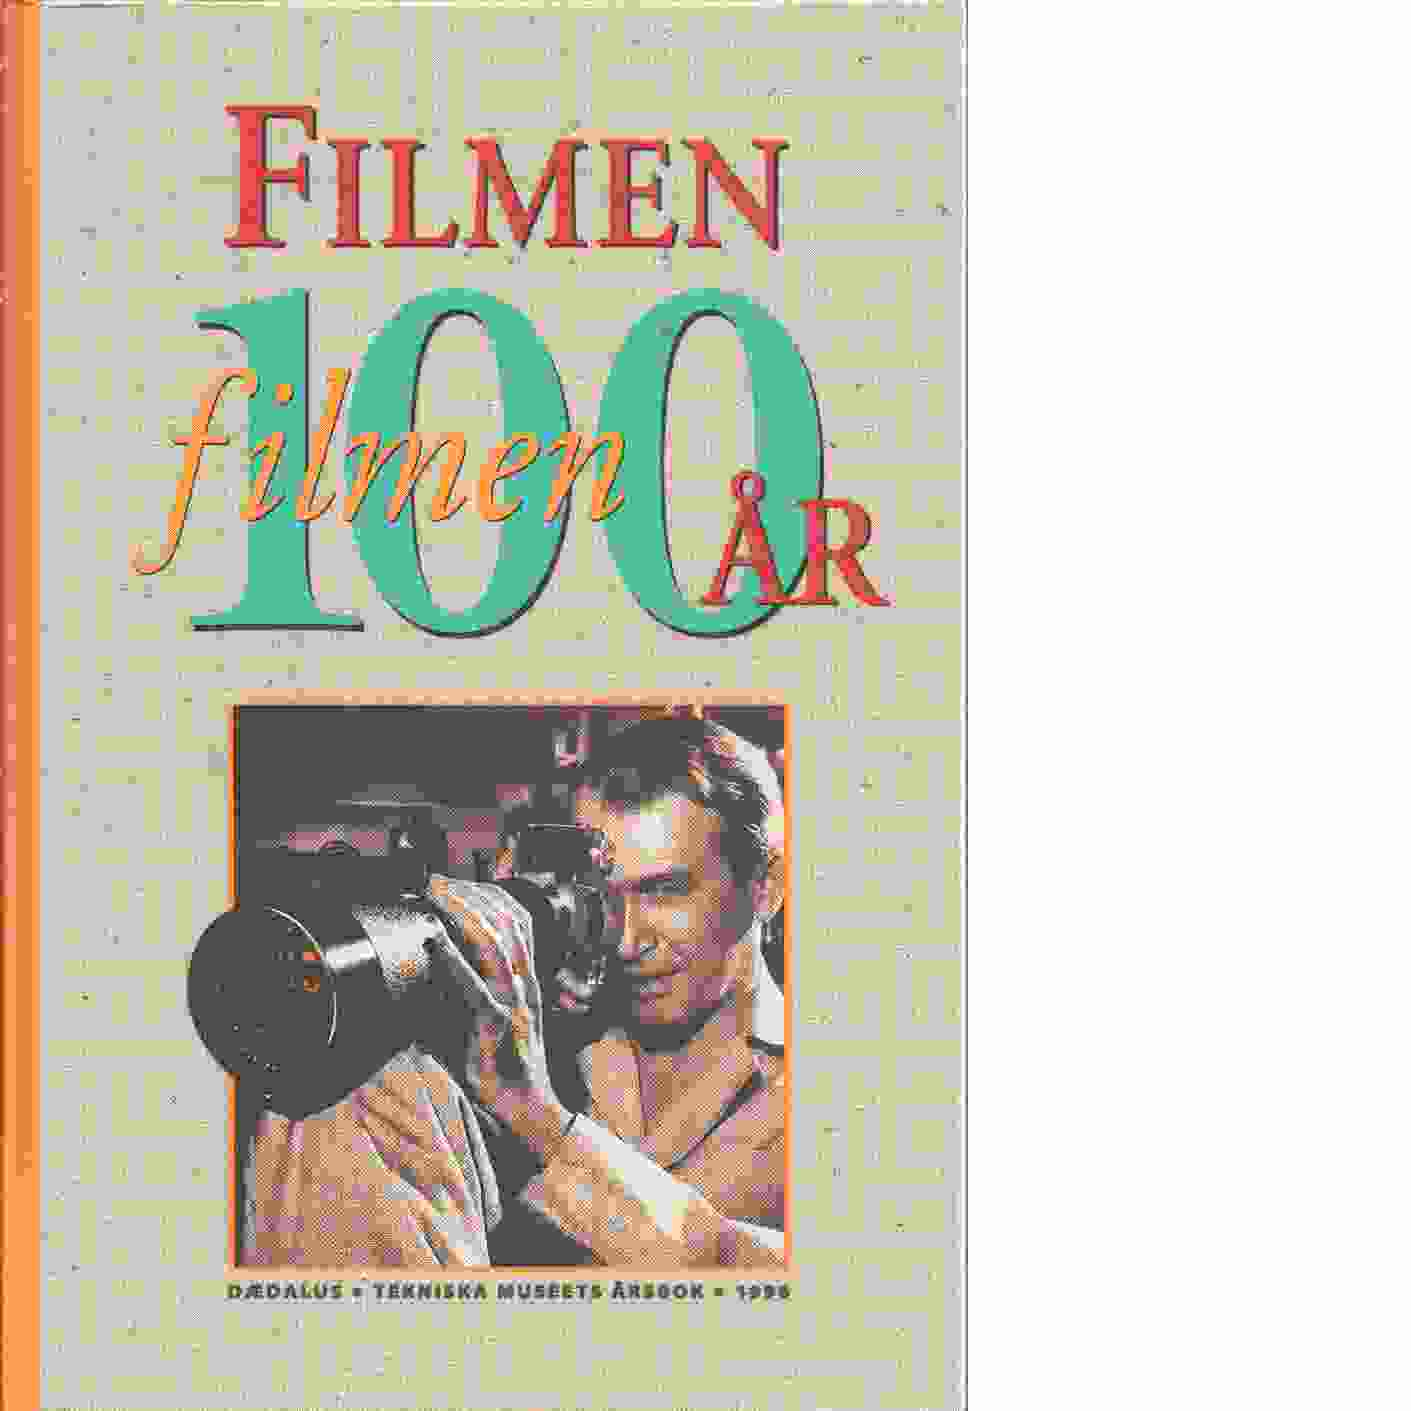 Filmen 100 år  Dædalus : [Tekniska museets årsbok]. - Red. Pettersson, Jan-Erik